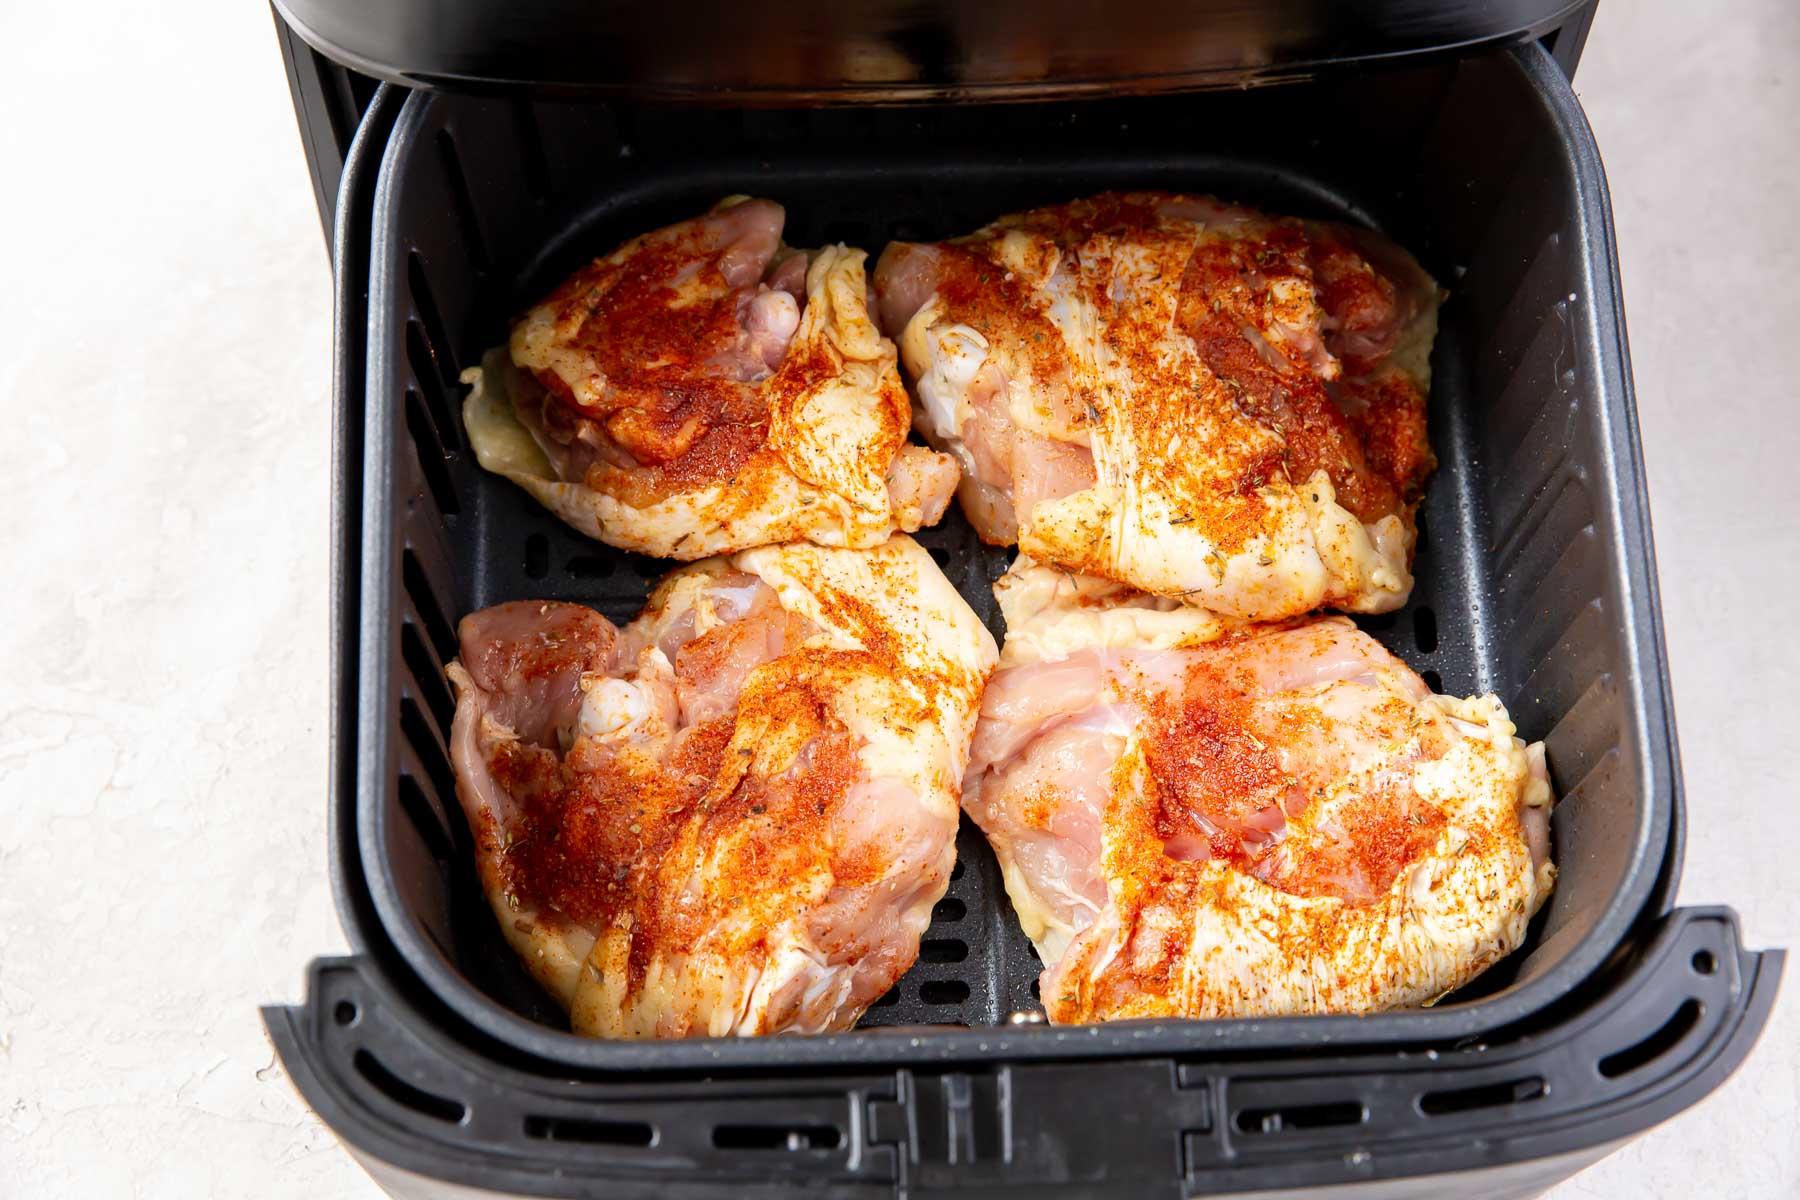 uncooked chicken thighs skin side down in air fryer